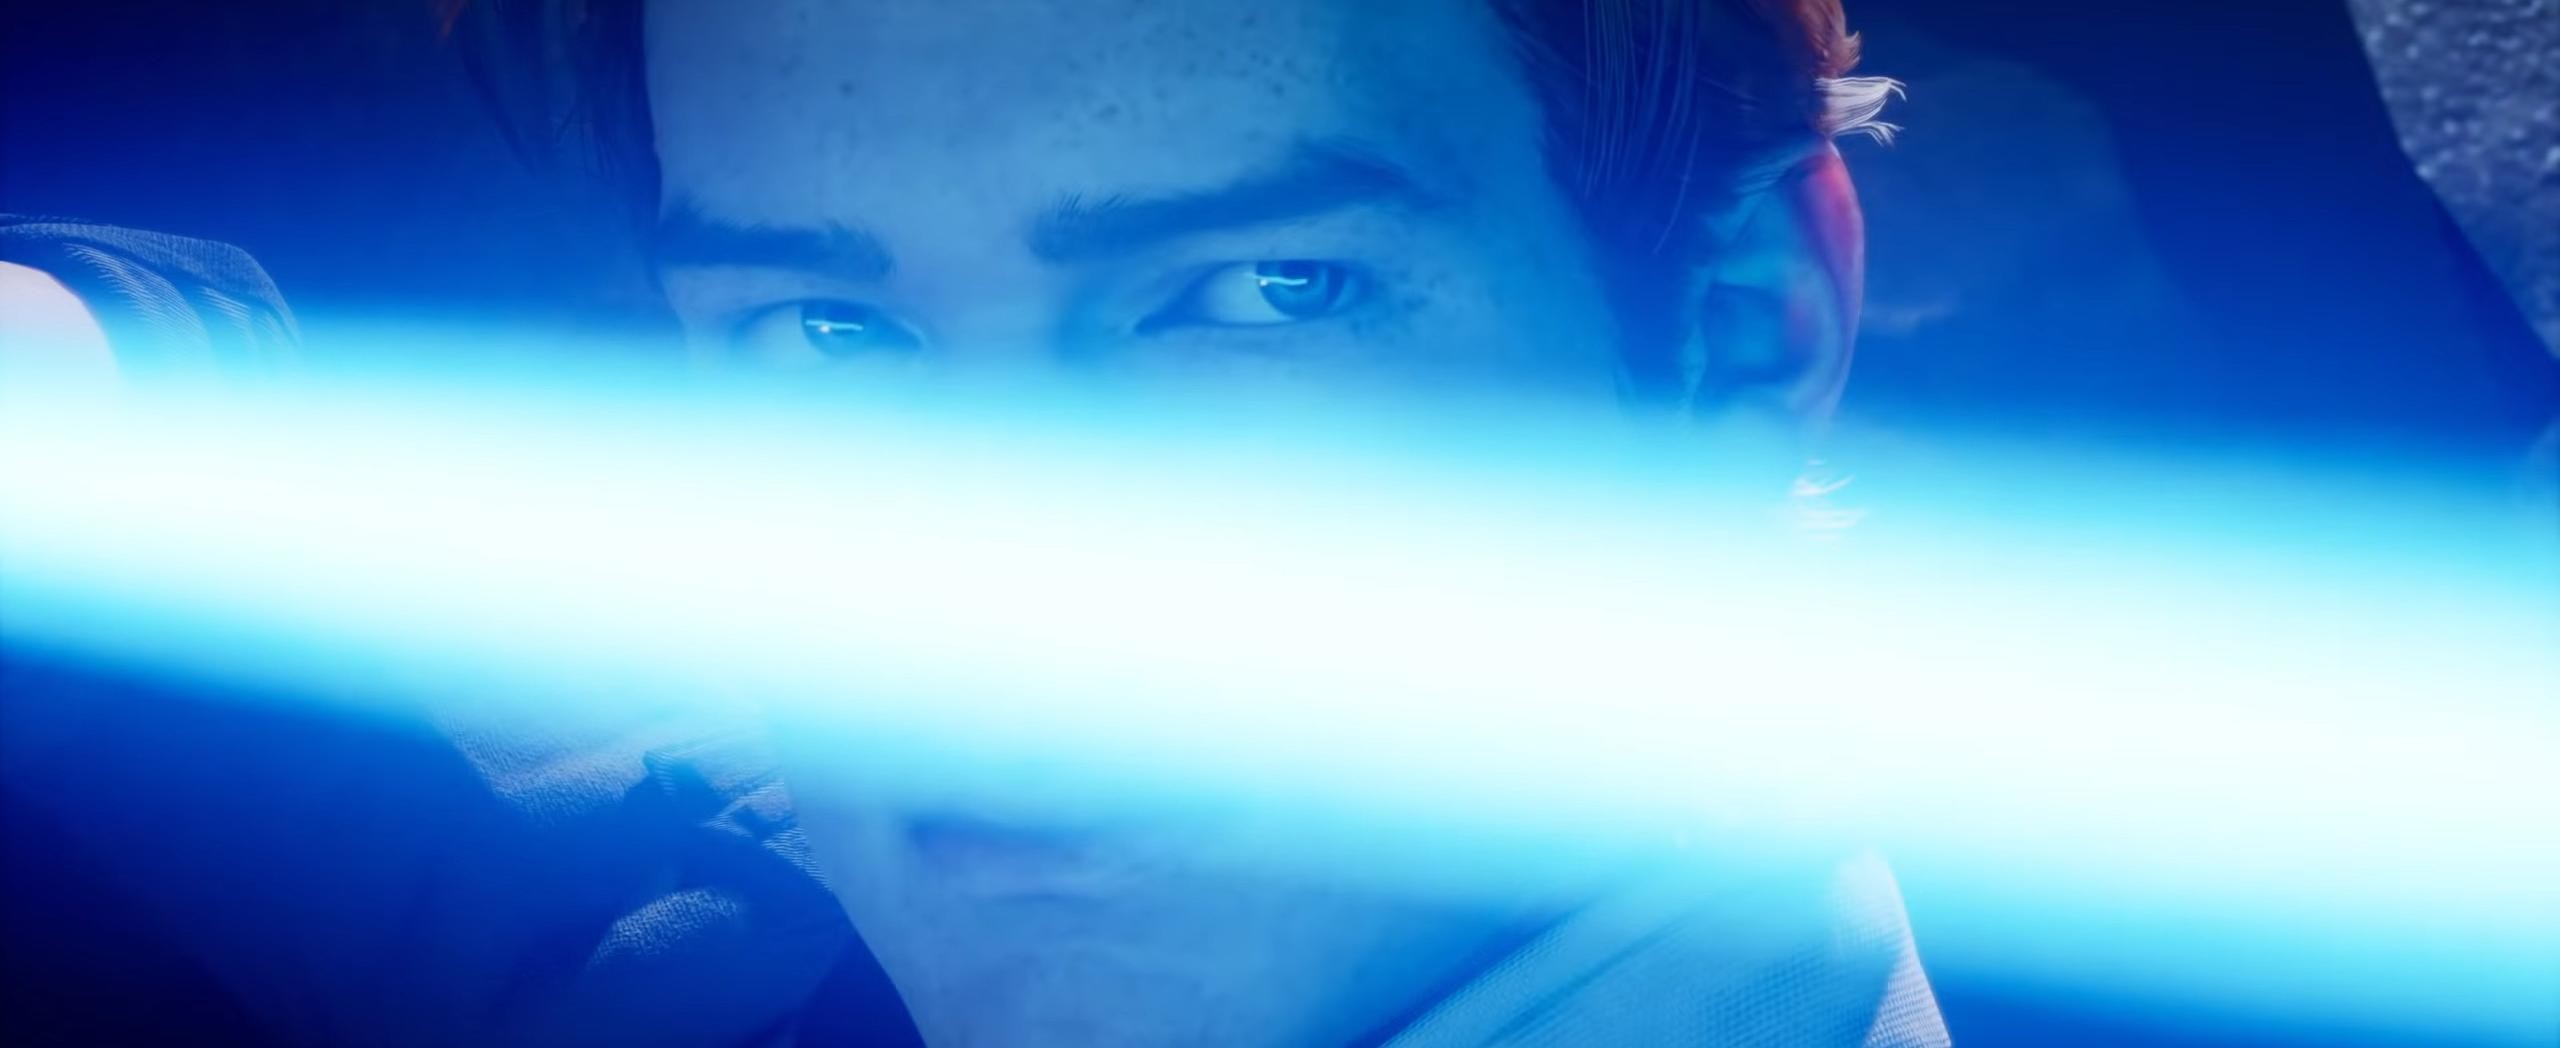 Star Wars Jedi Fallen Order Cal Kestis spada laser